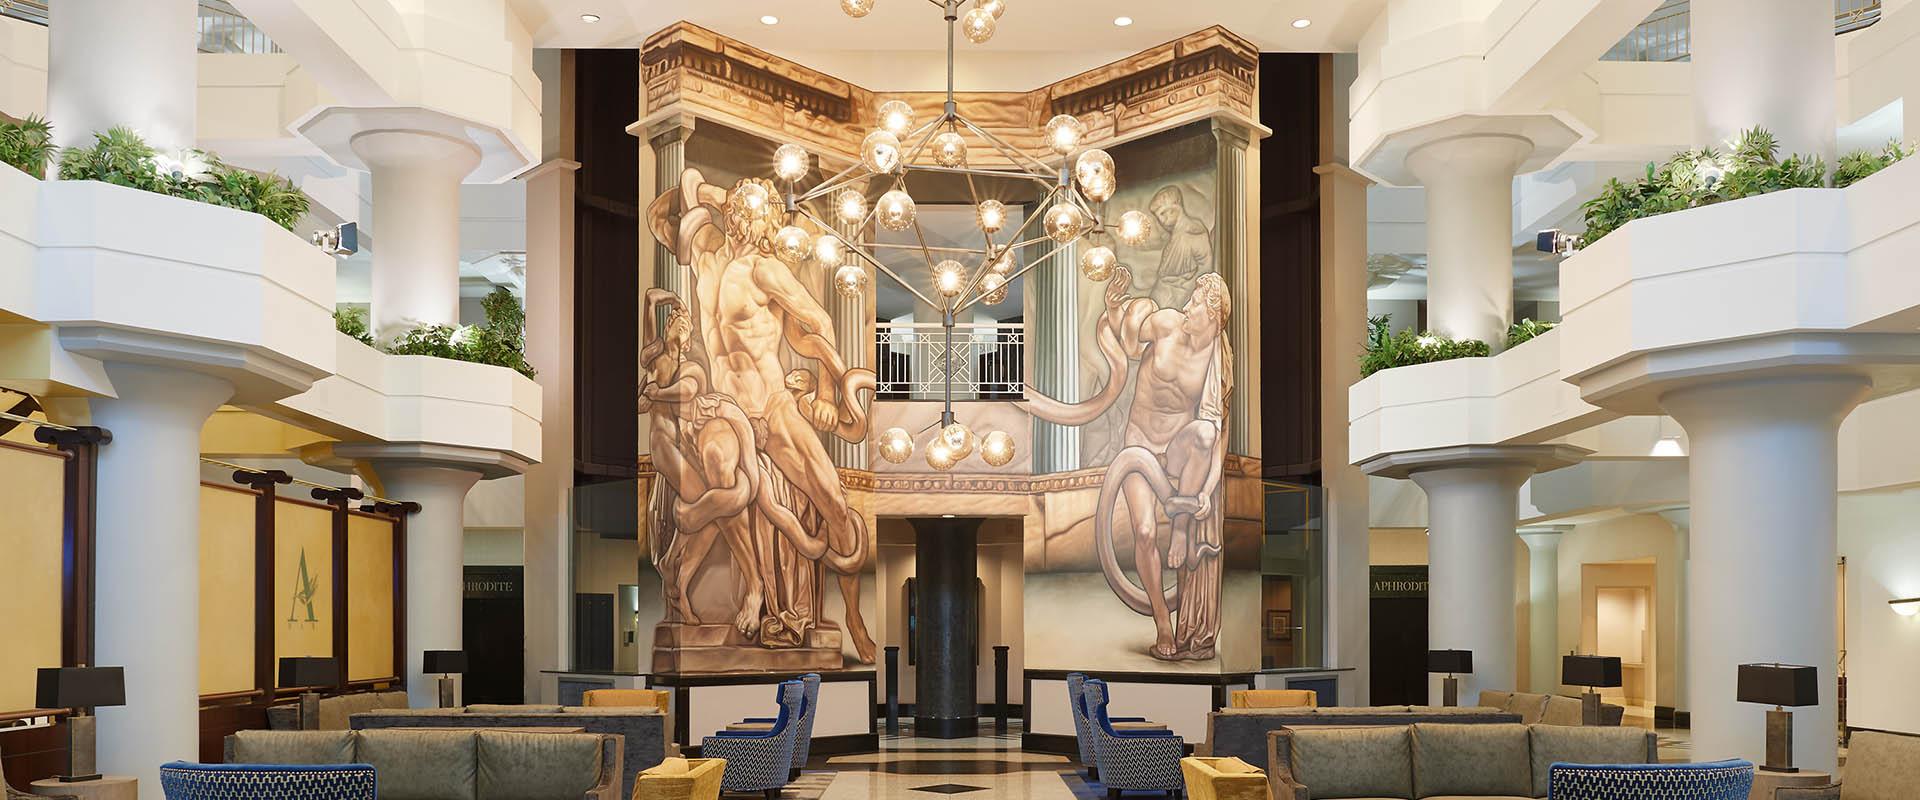 Parking and Directions   Atheneum Suites Hotel Detroit